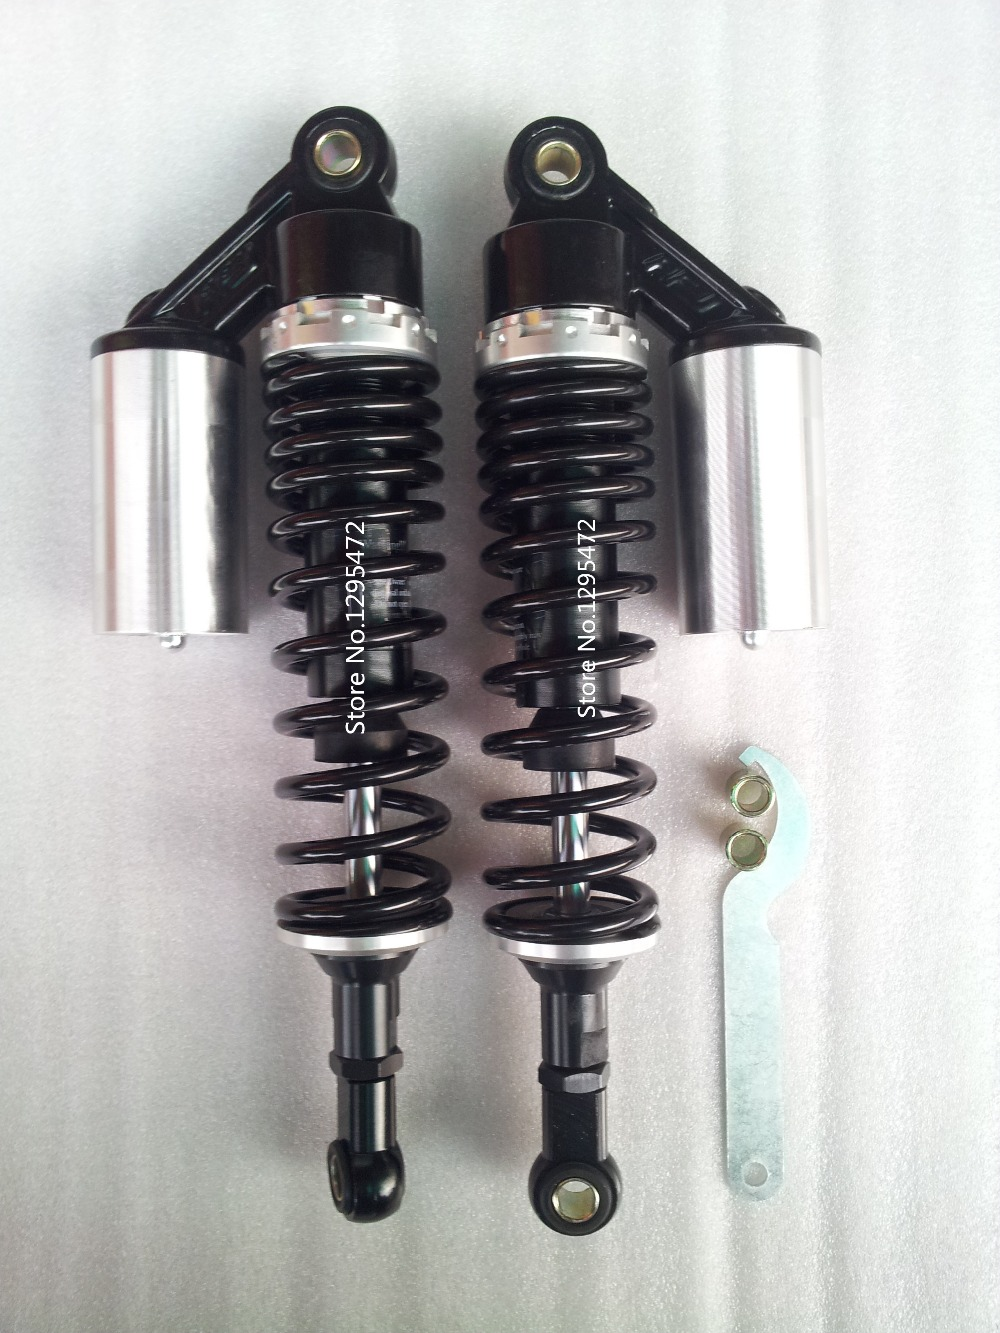 13 5 340mm 8mm spring Air Shock Absorber for GN400 VMAX cb400 Quad atv black silver